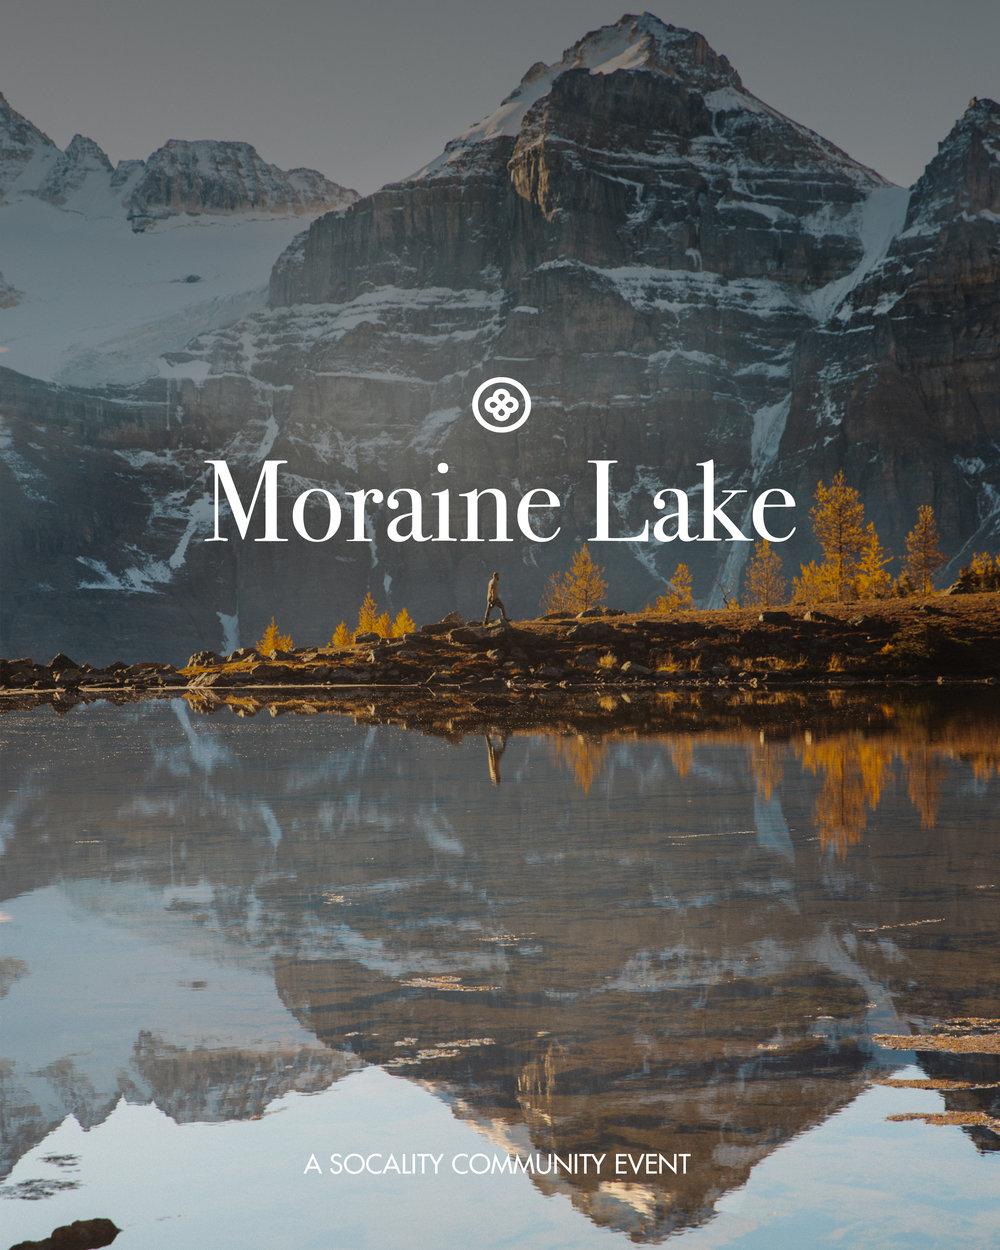 Moraine-4x5_1.jpg